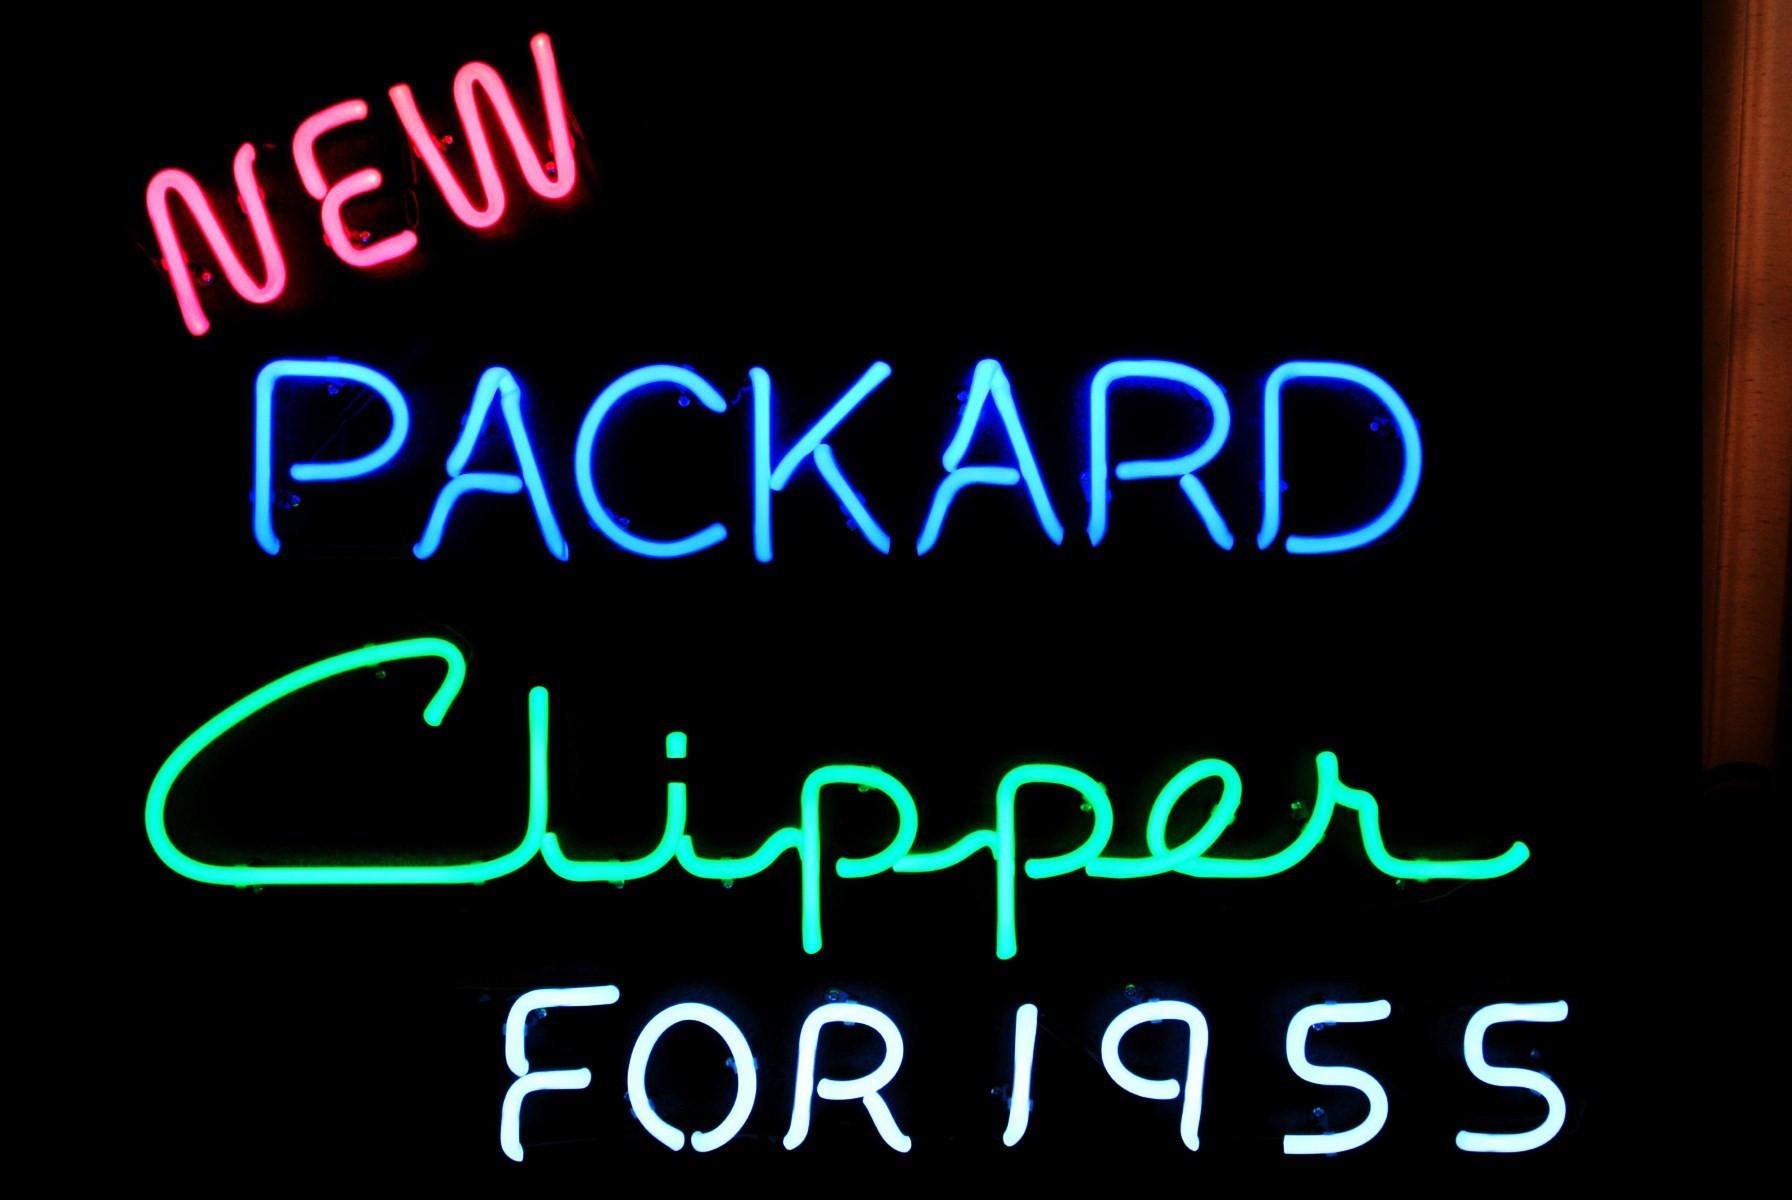 New Packard Clipper for 1955 - Packard Dealership Neon Sign by John Barton - BartonNeonMagic.com